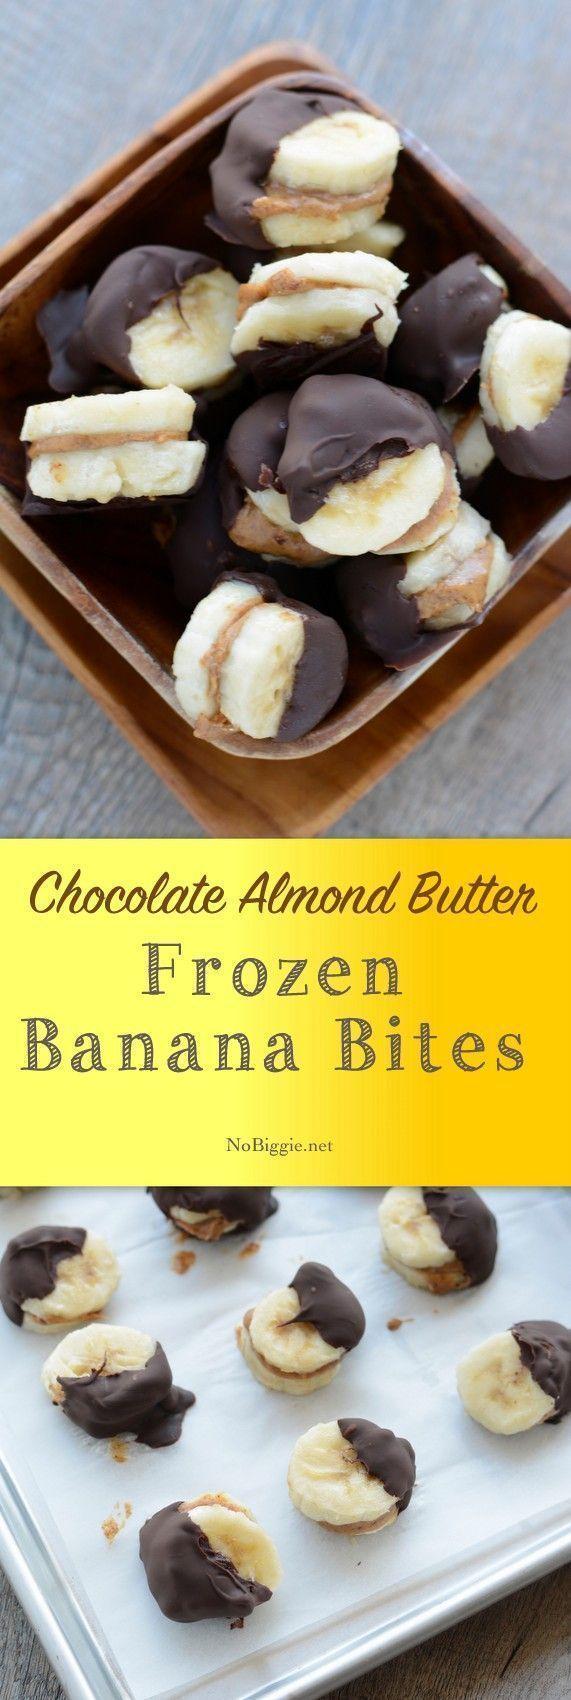 Frozen Banana Bites   – D E S S E R T